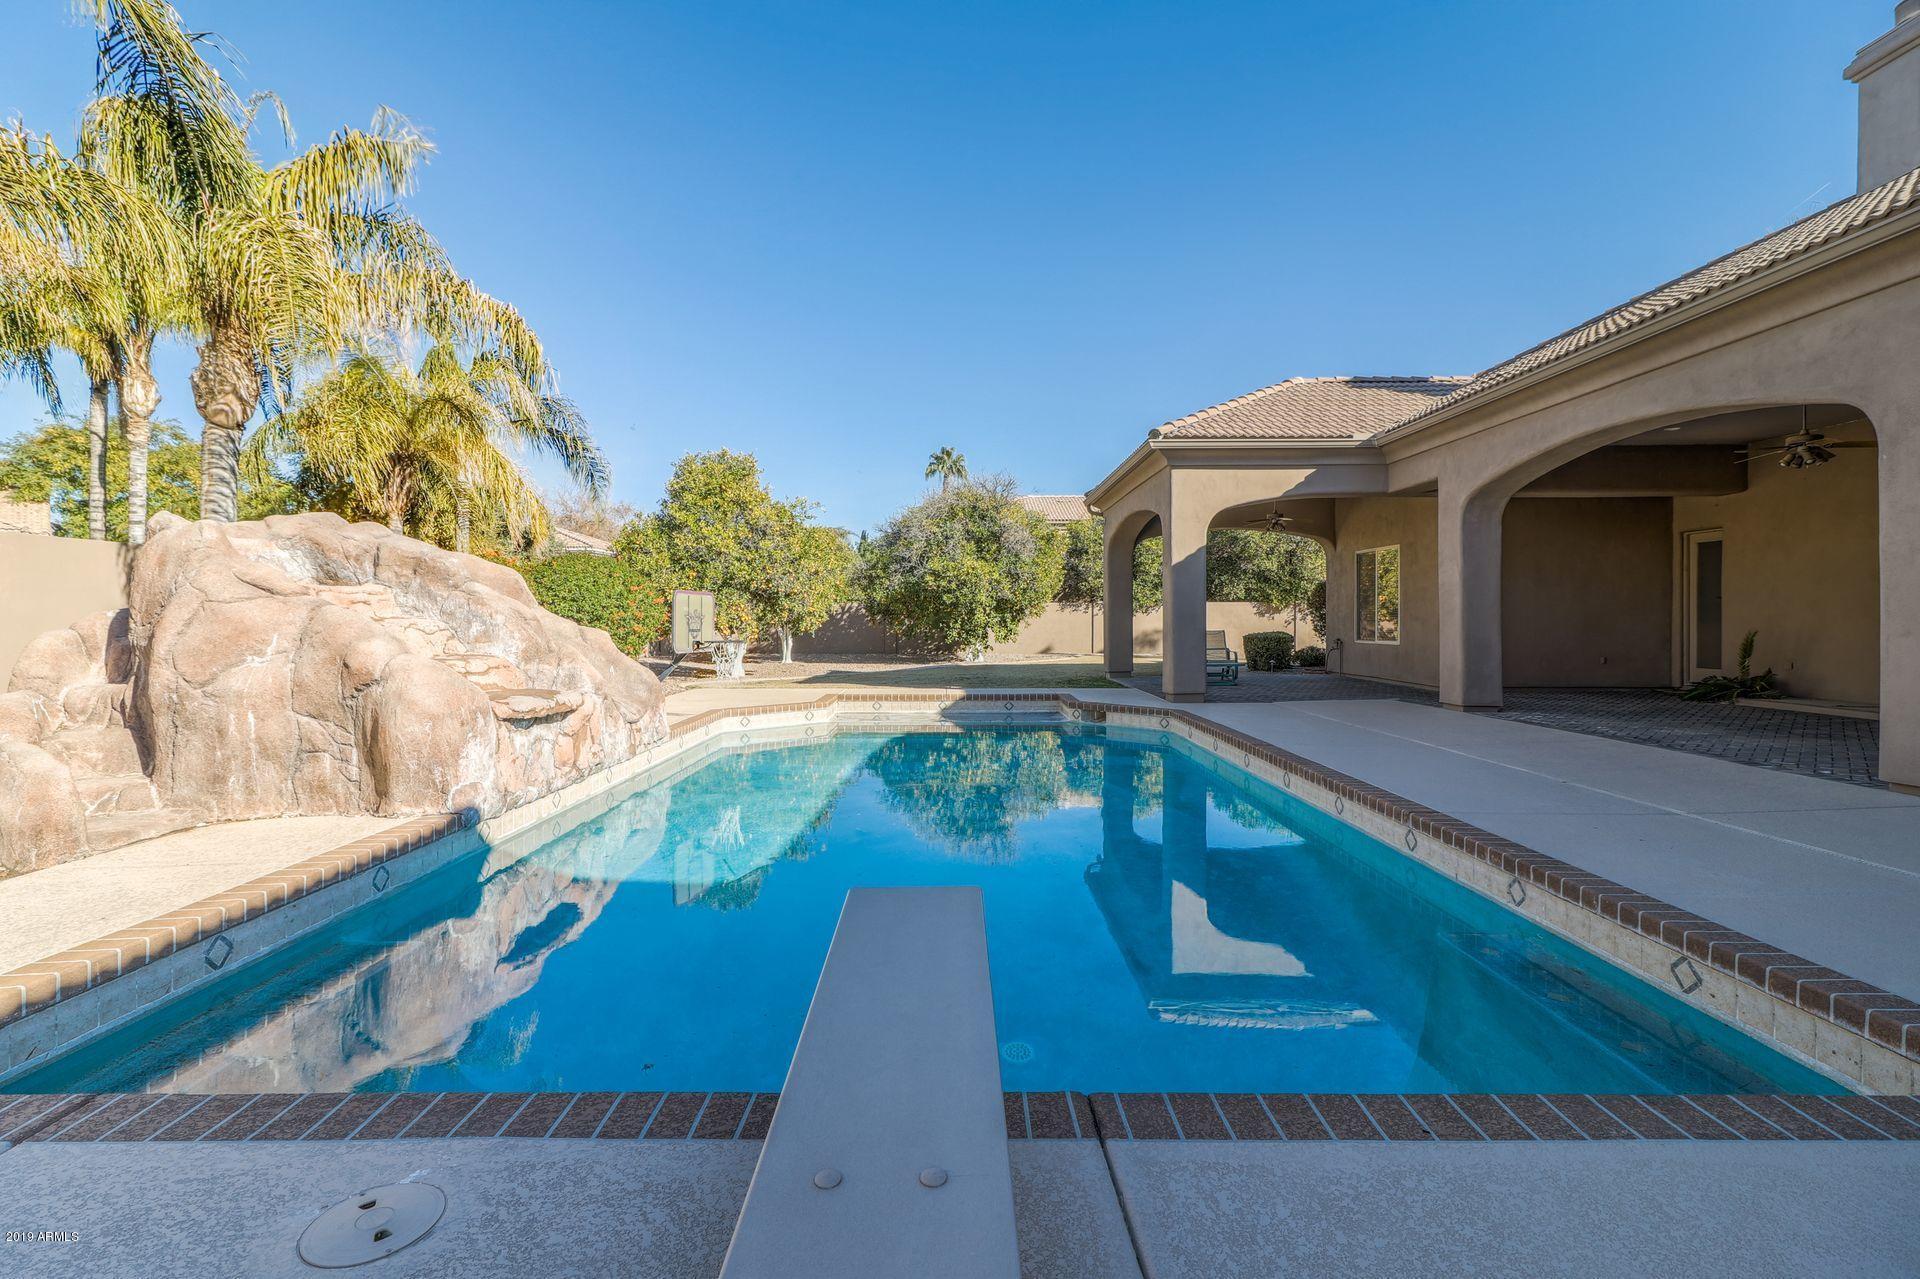 MLS 5883940 3928 E MINTON Circle, Mesa, AZ 85215 Mesa AZ The Groves